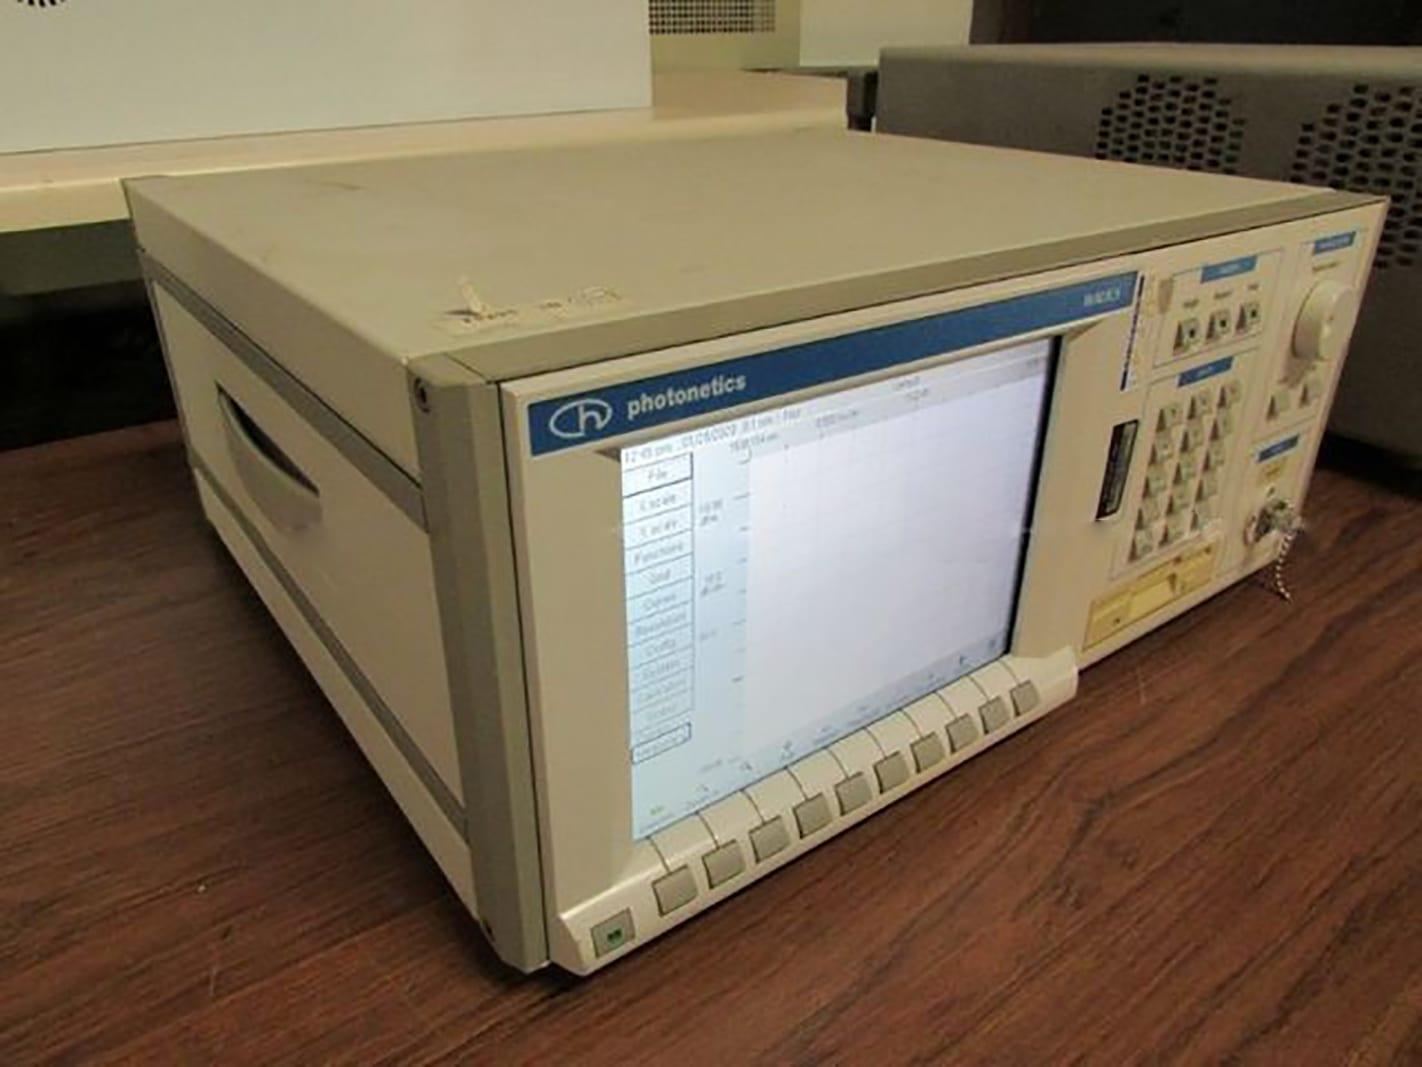 Buy Photonetics Walics 3651 HR 12 Optical Spectrum Analyzer Online